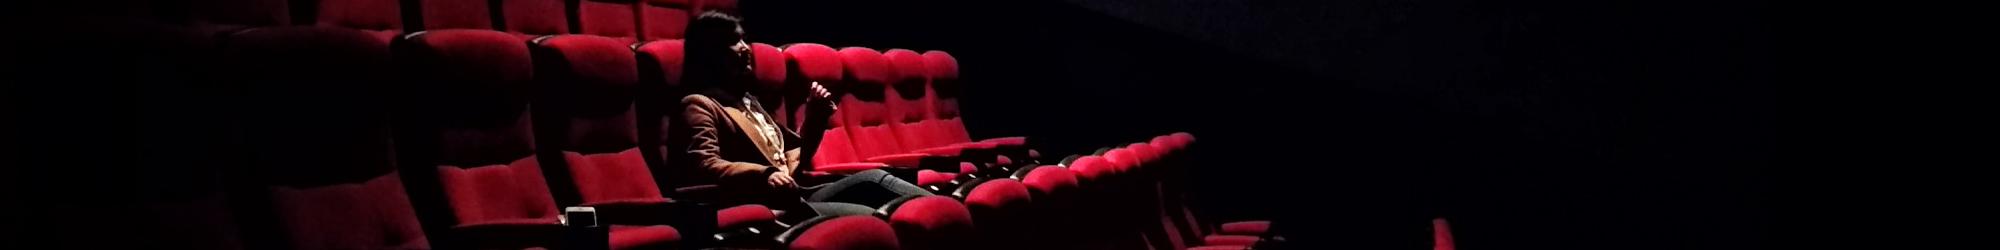 woman sitting in a cinema